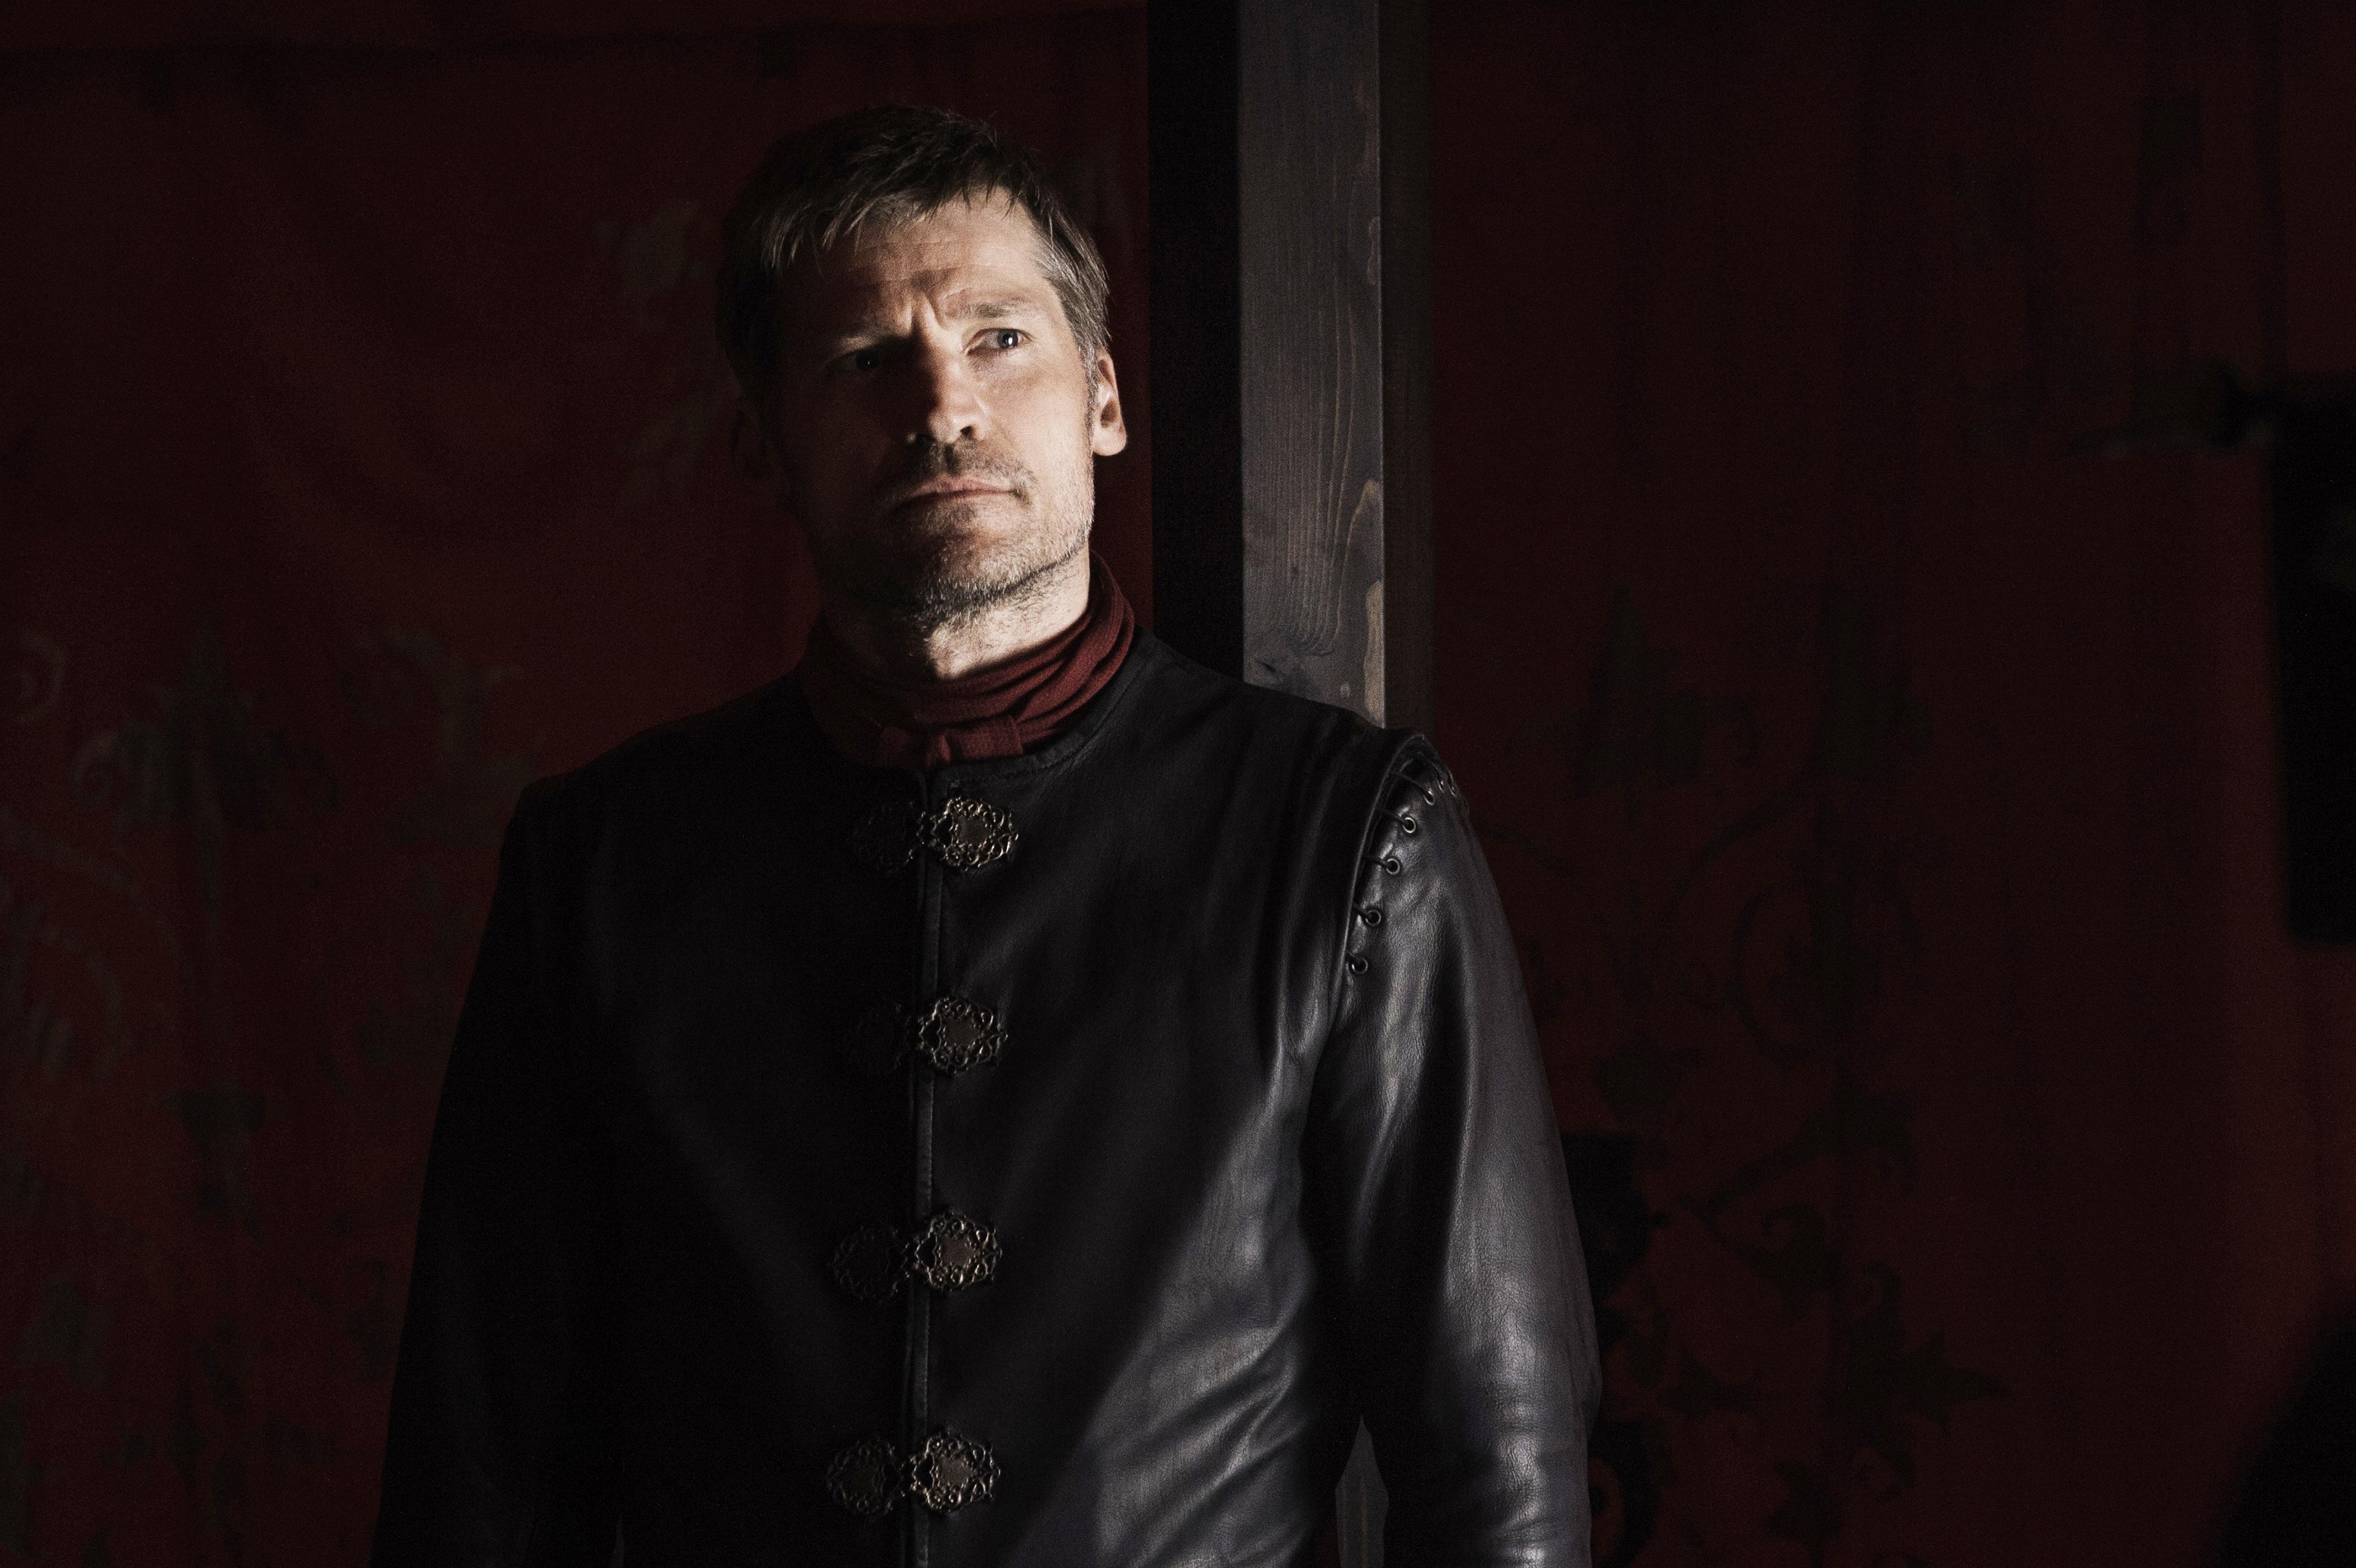 Nikolaj Coster-Waldau in Game of Thrones, season 6, episode 8.